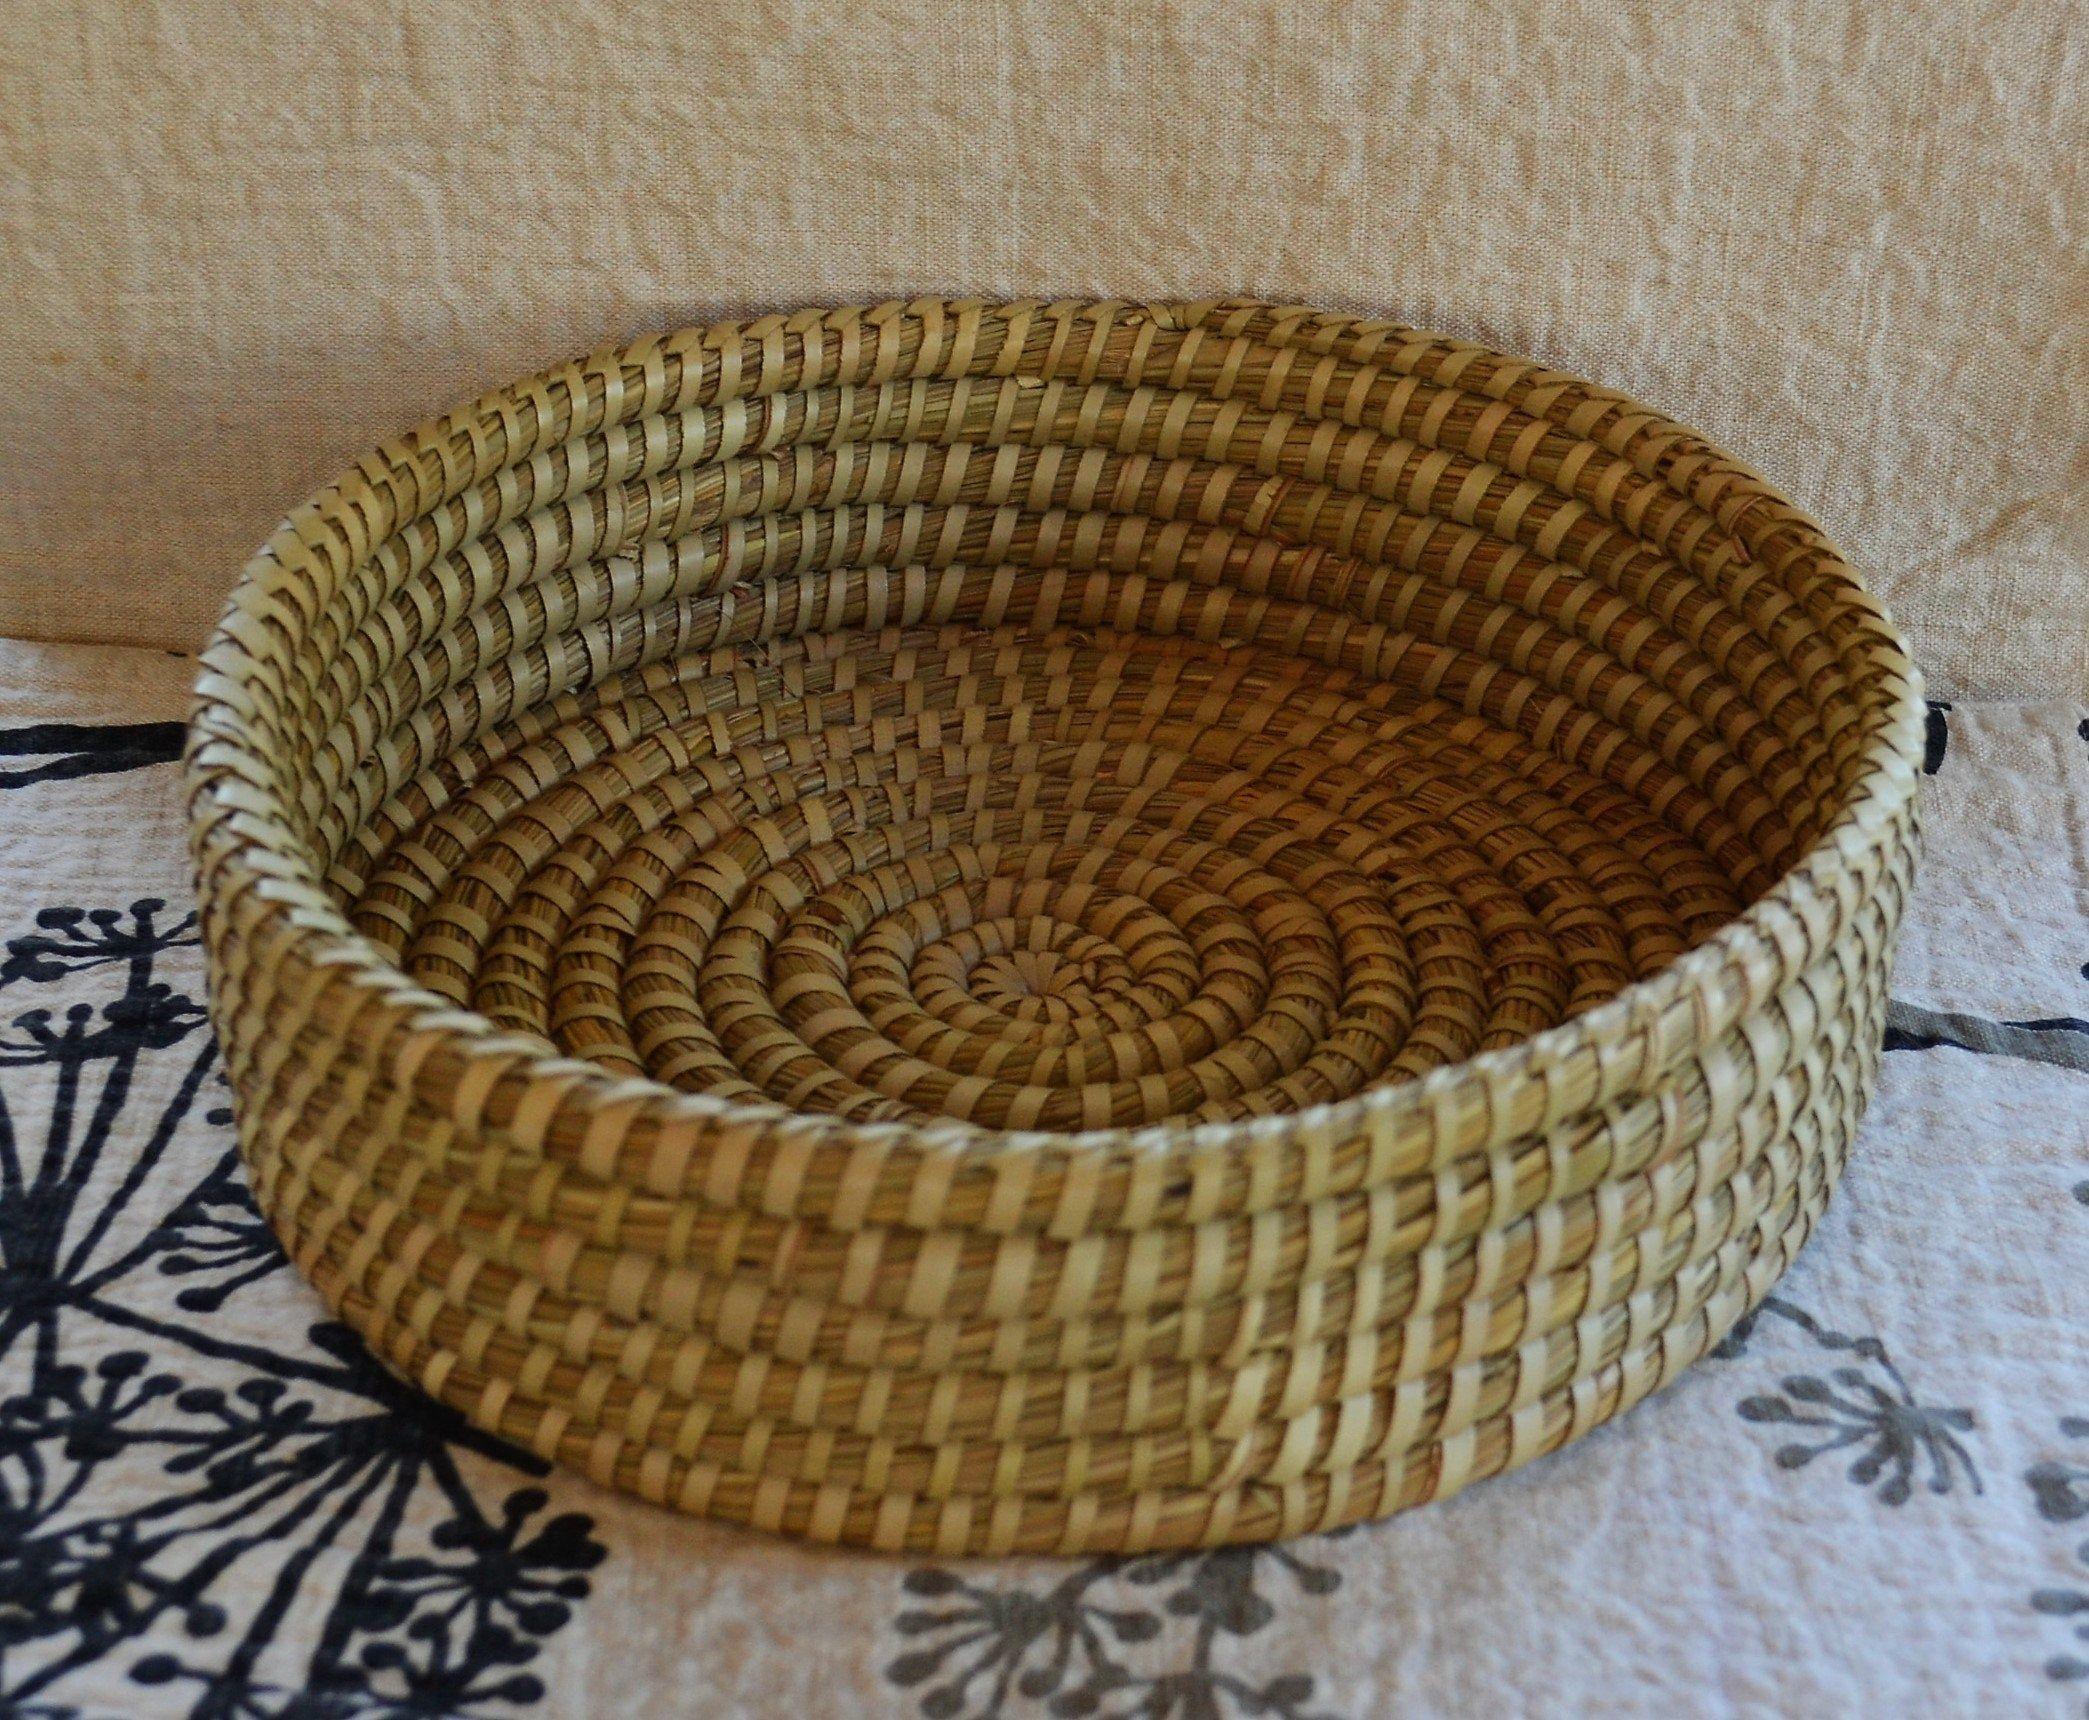 Vintage Coiled Basket Bowl Natural Fiber Fruit Vegetable Bowl Natural Tan Colors Rustic Basket Vintage Woven Bowl Farmhouse Tribal Decor #fiberfruits